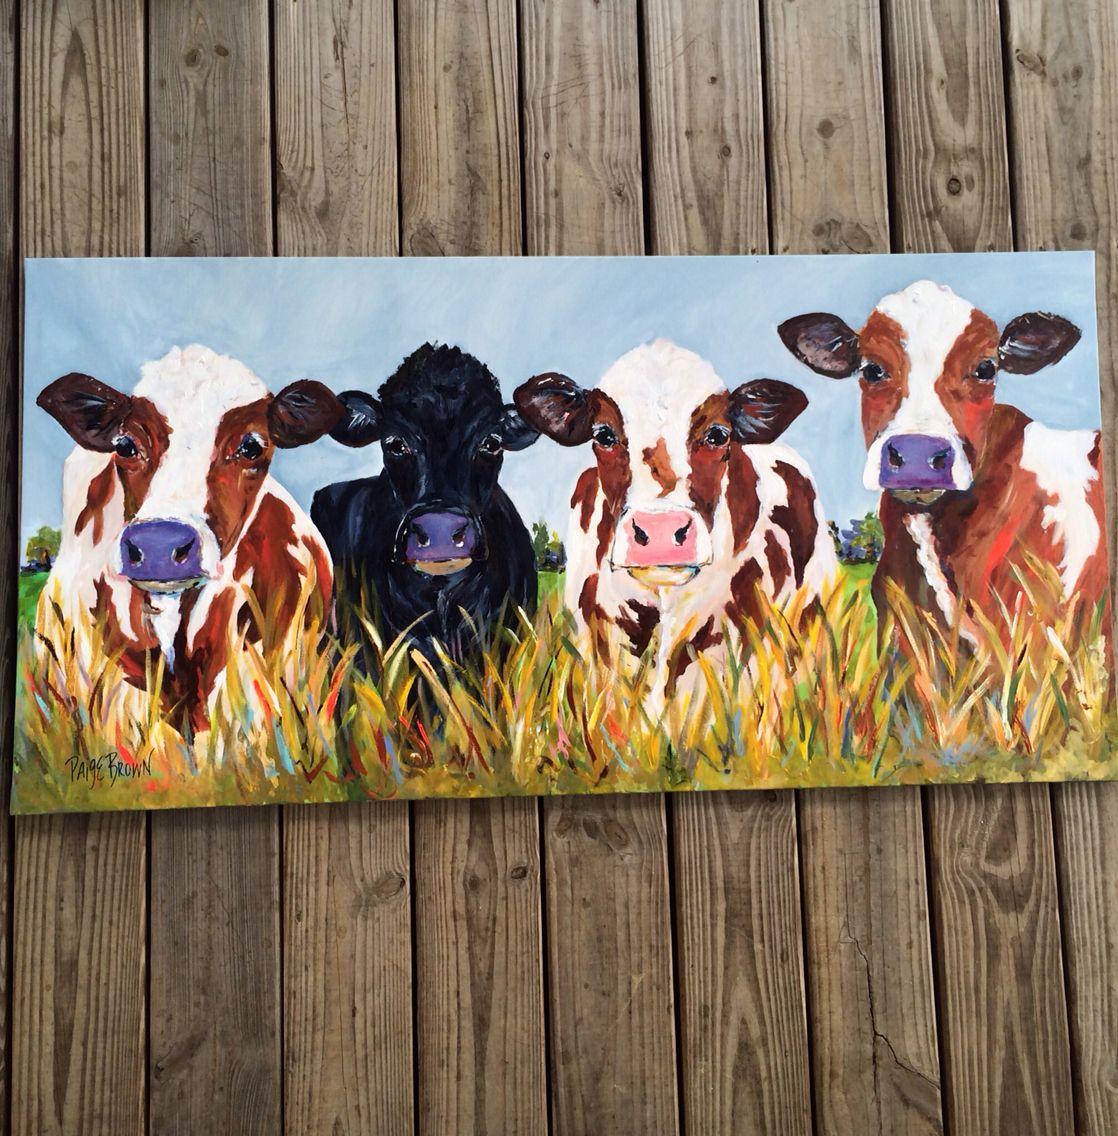 Paigebrownart Etsy Original Art Painting 24 X 48 Canvas Cow Painting Farmhouse Decor Farm Art One Of A Kind Cow Painting Farm Art Farm Paintings